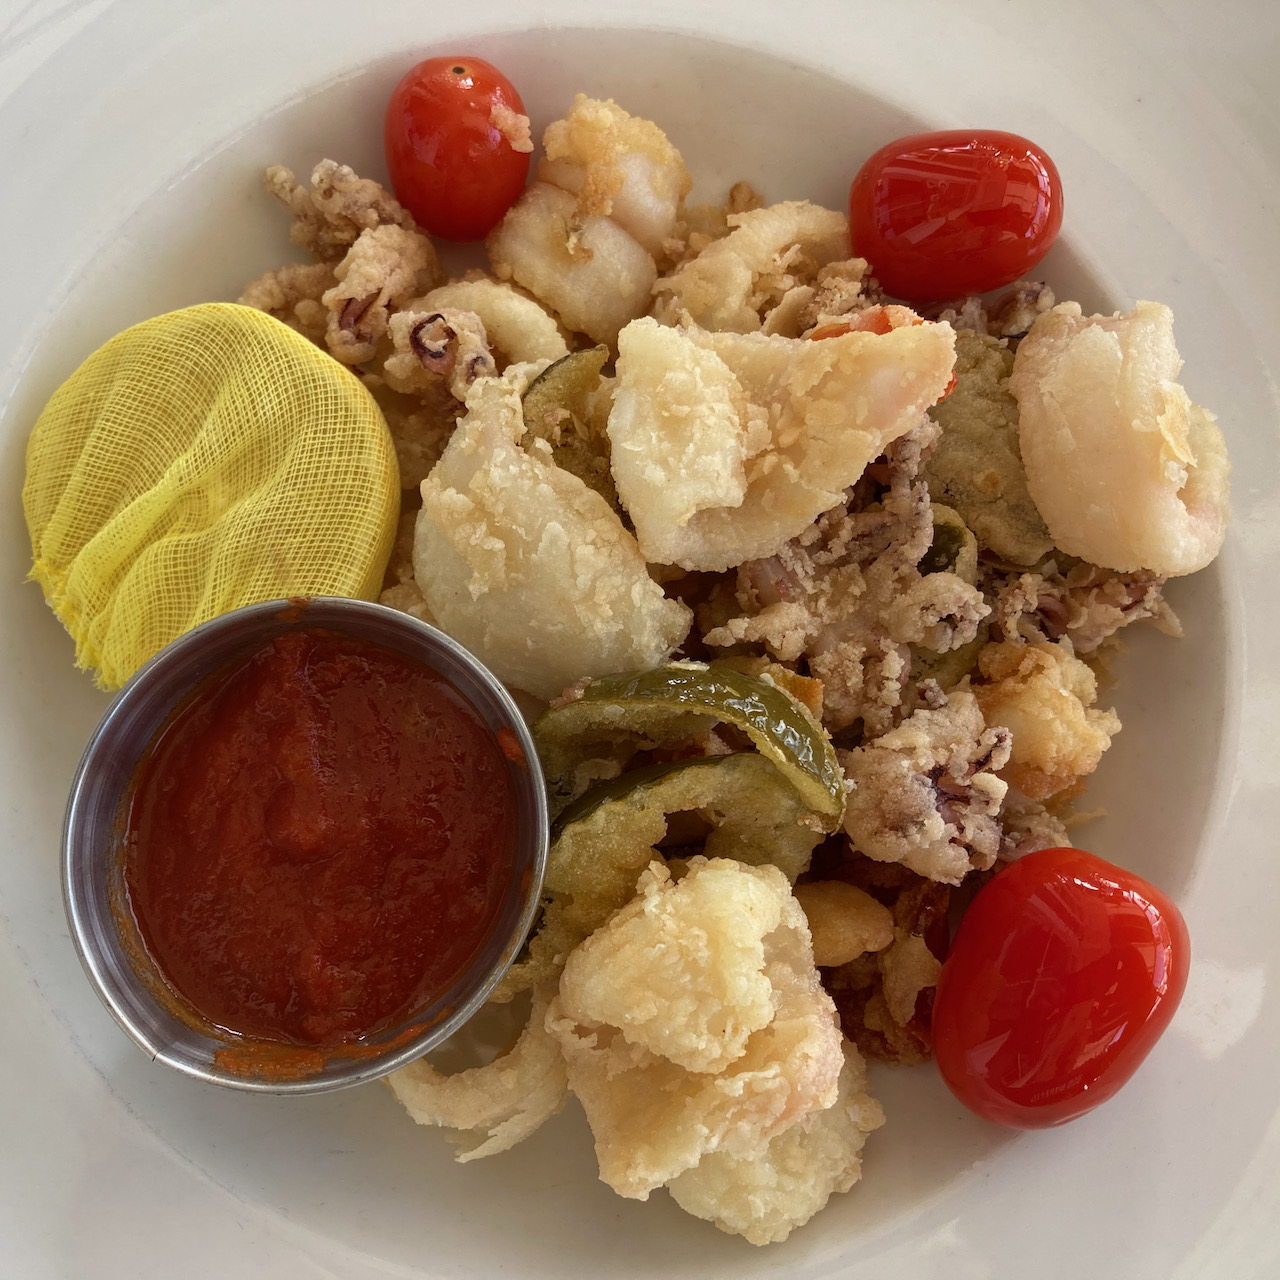 Bowl with fried calamari.